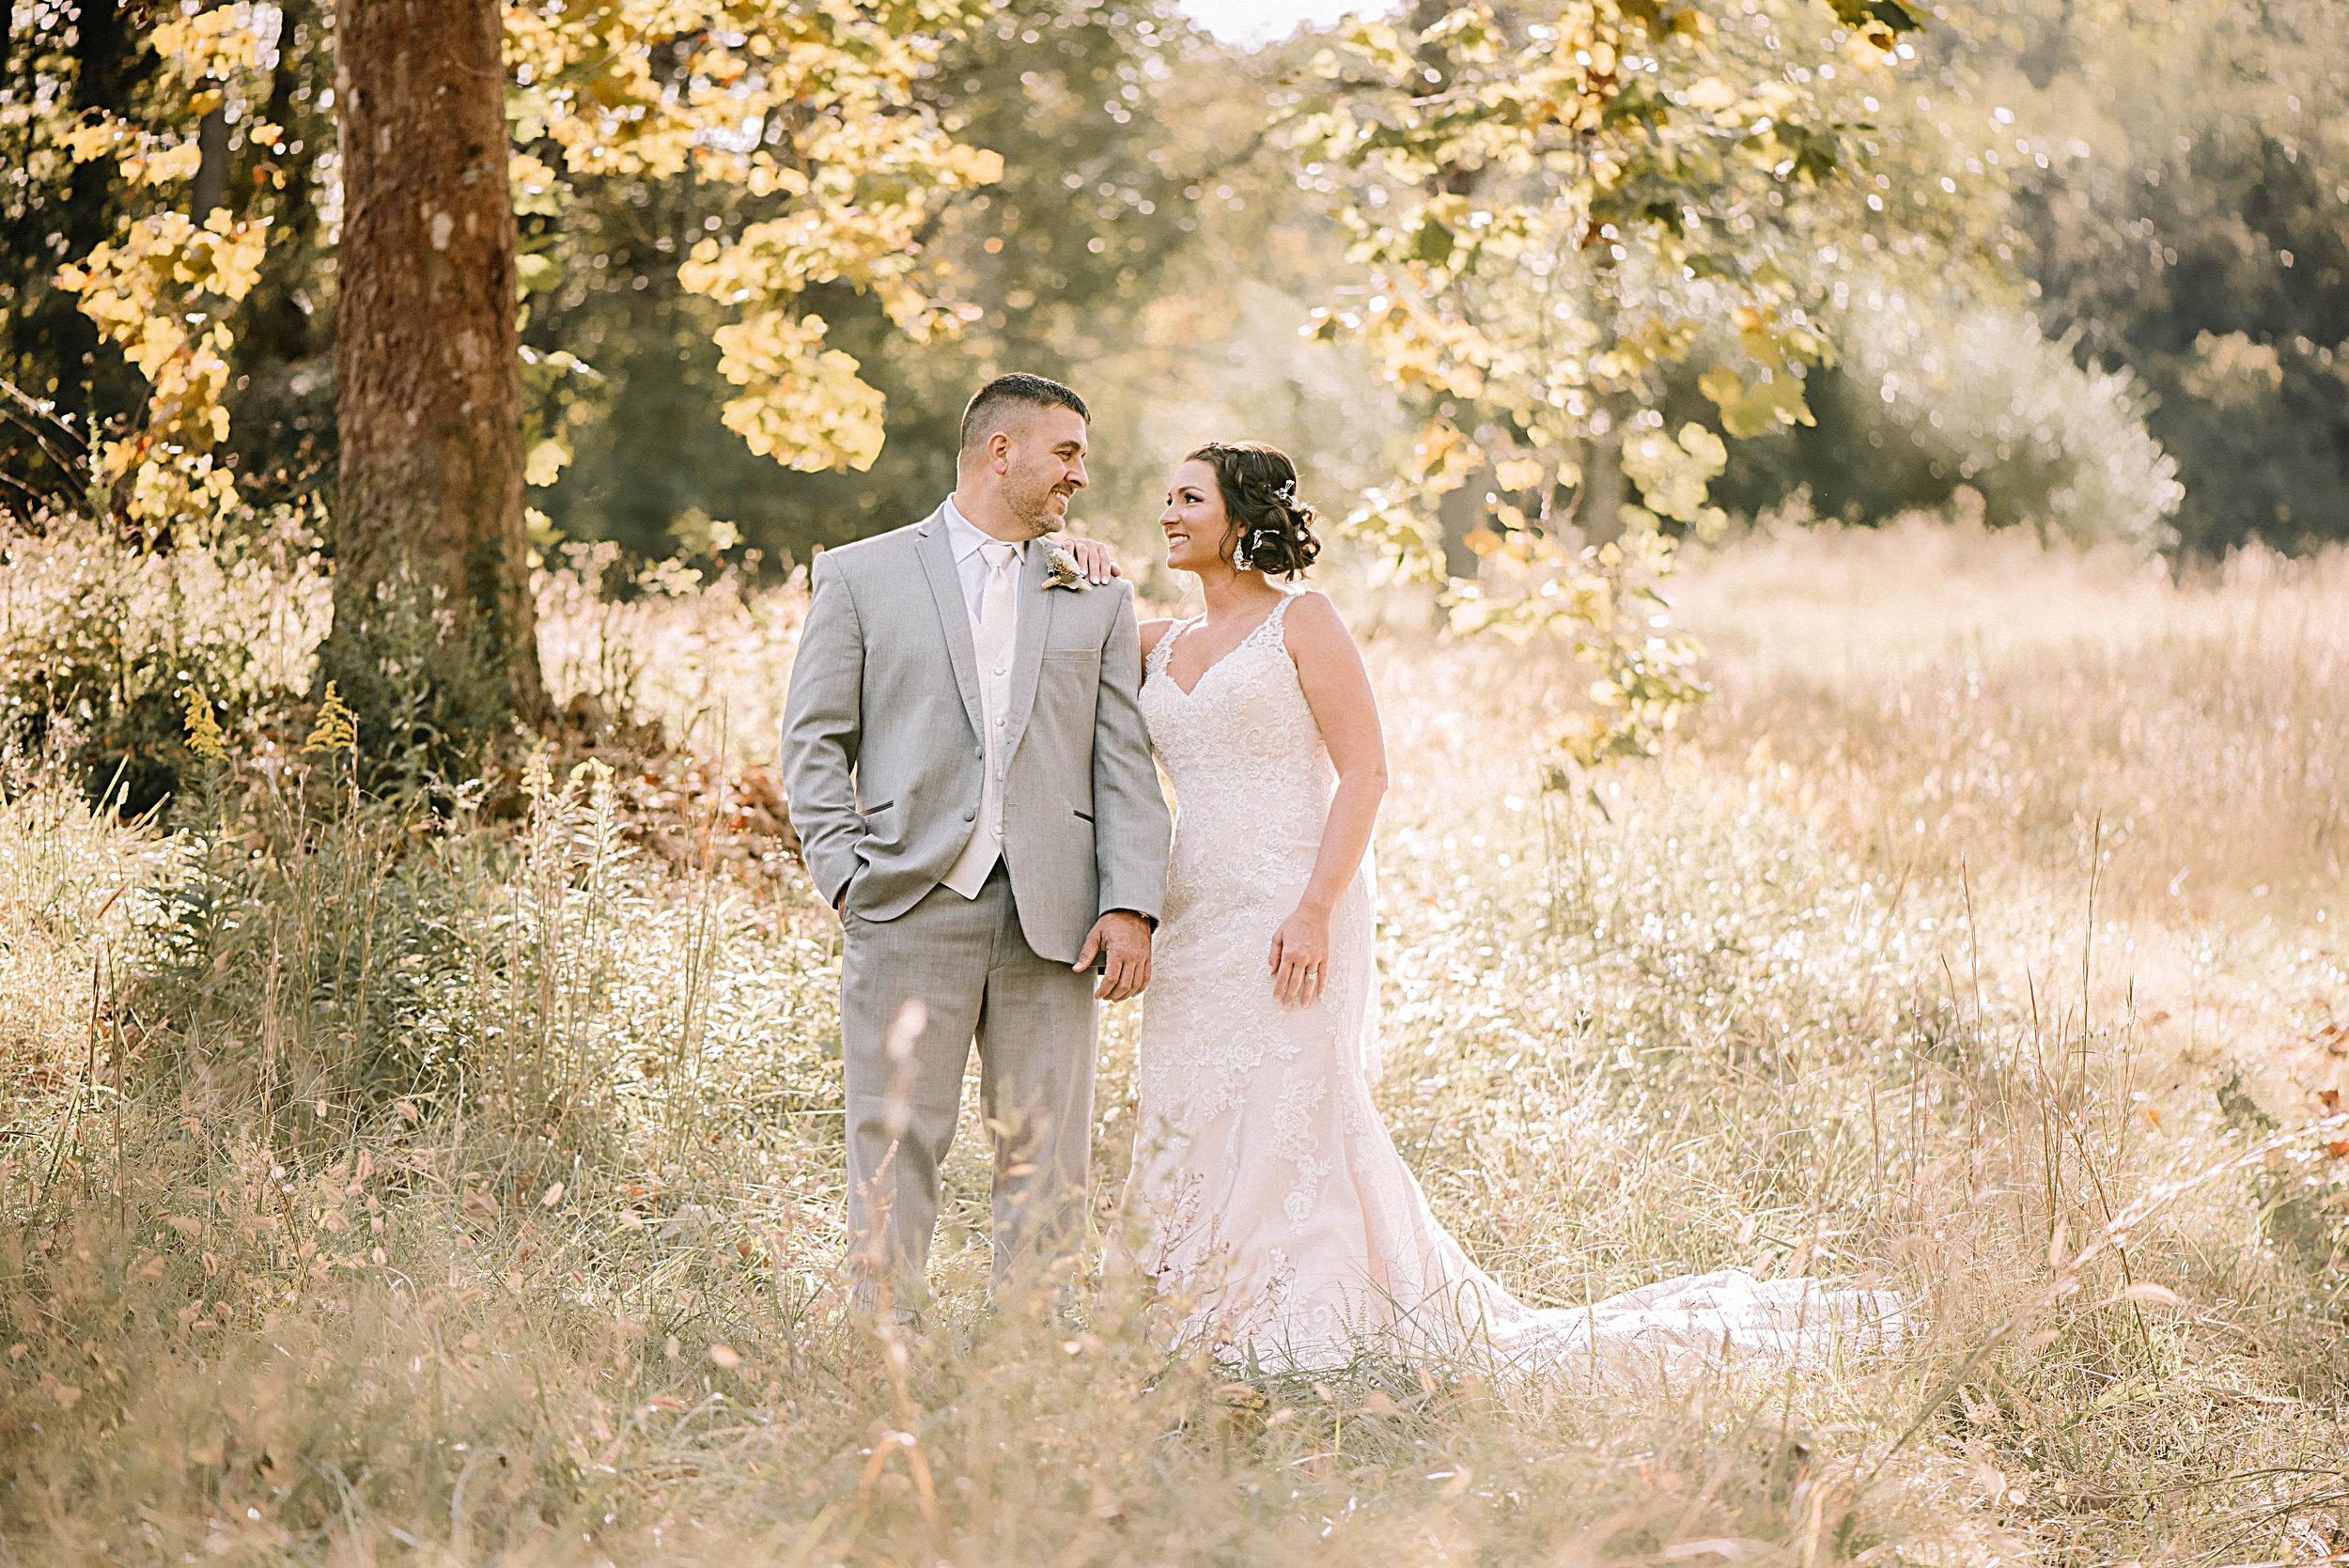 Kristina & Corey Choate - October 12, 2018Logan Kilgore Photography